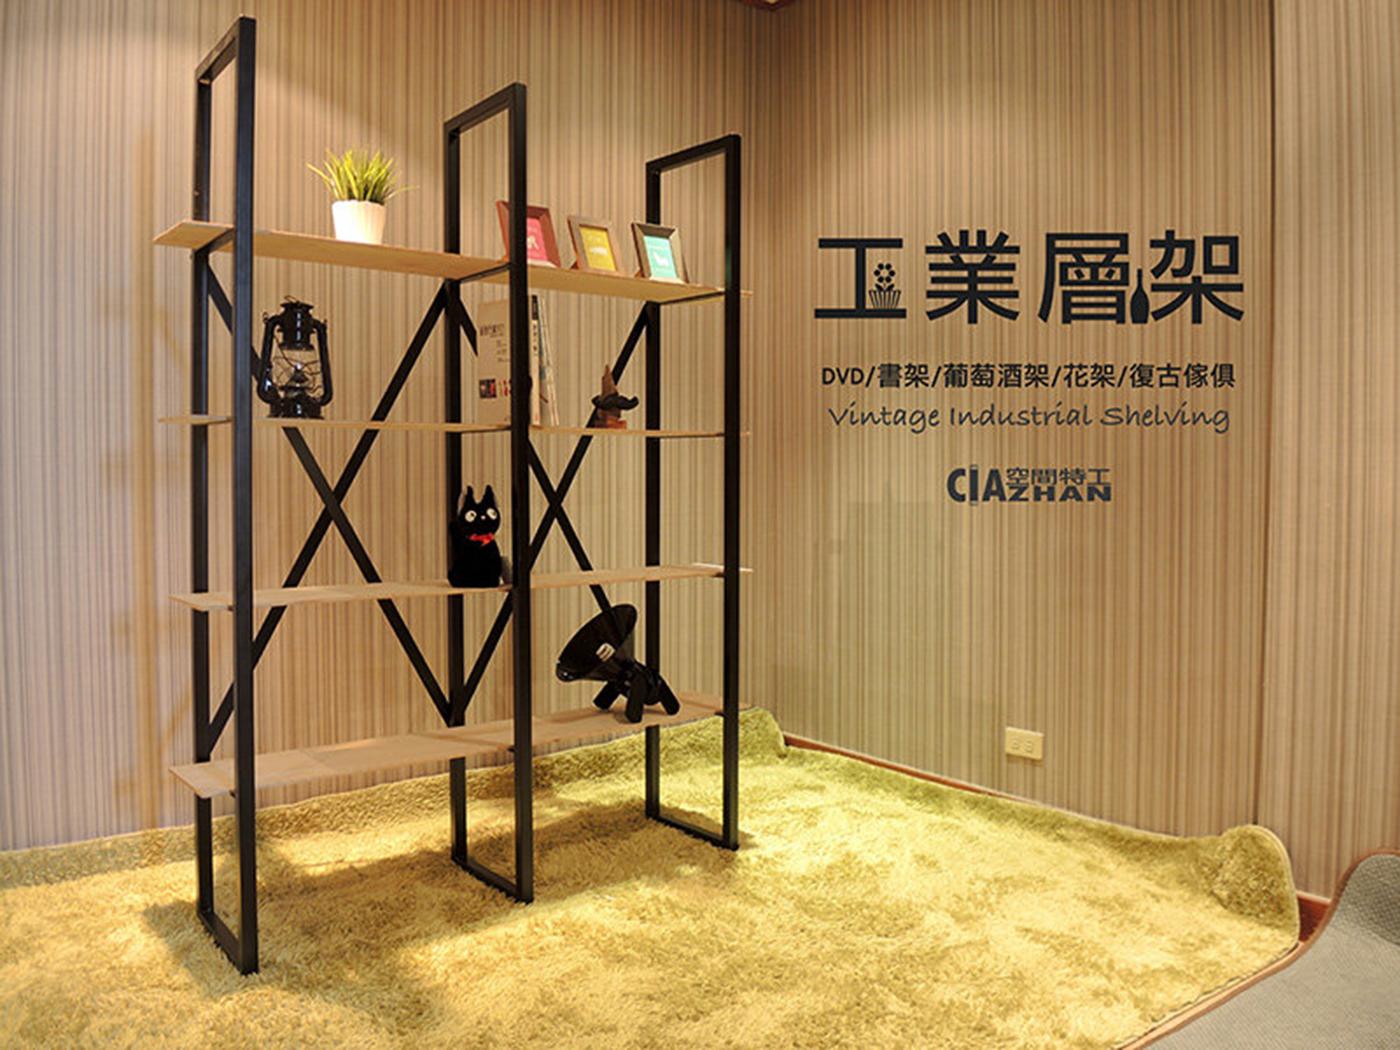 loft工業層架♞空間特工♞30mm極粗方鐵管!18mm木板 工業風質感傢俱 櫥櫃 diy收納 四層收納櫃 可訂製 免運費